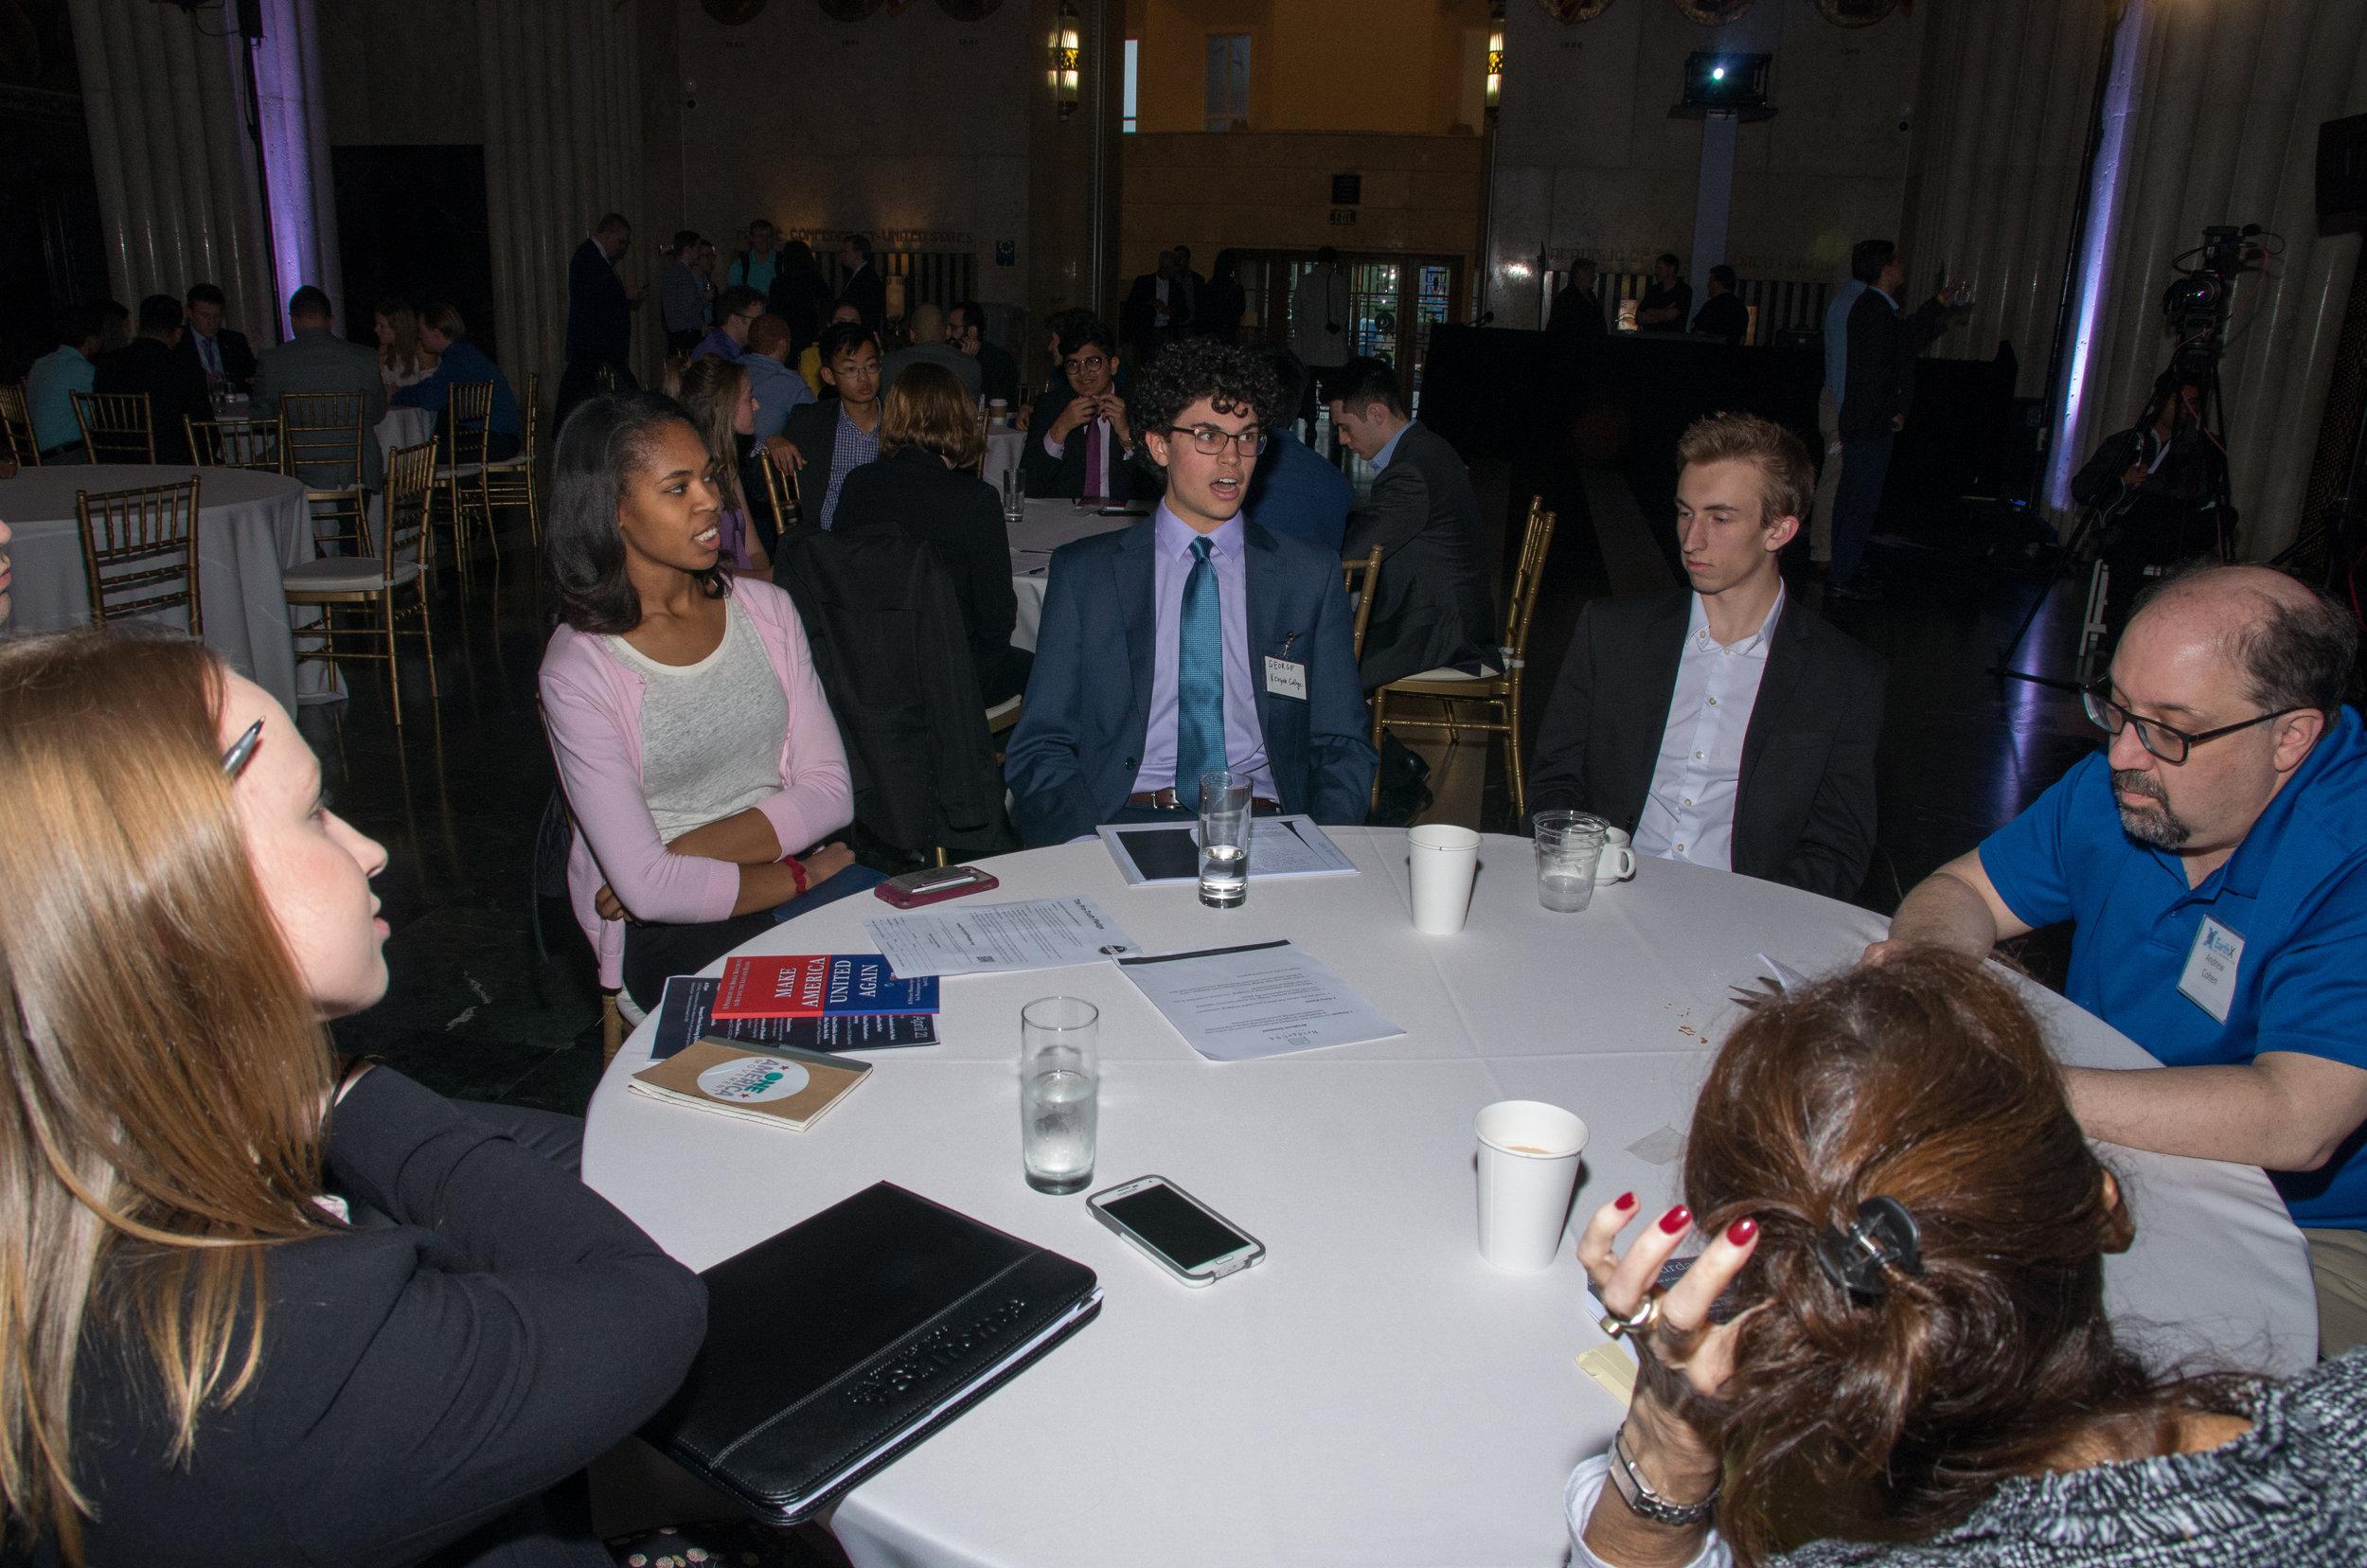 2018-04-21 - EarthX Bridge Summit Conference (SD) 066.jpg